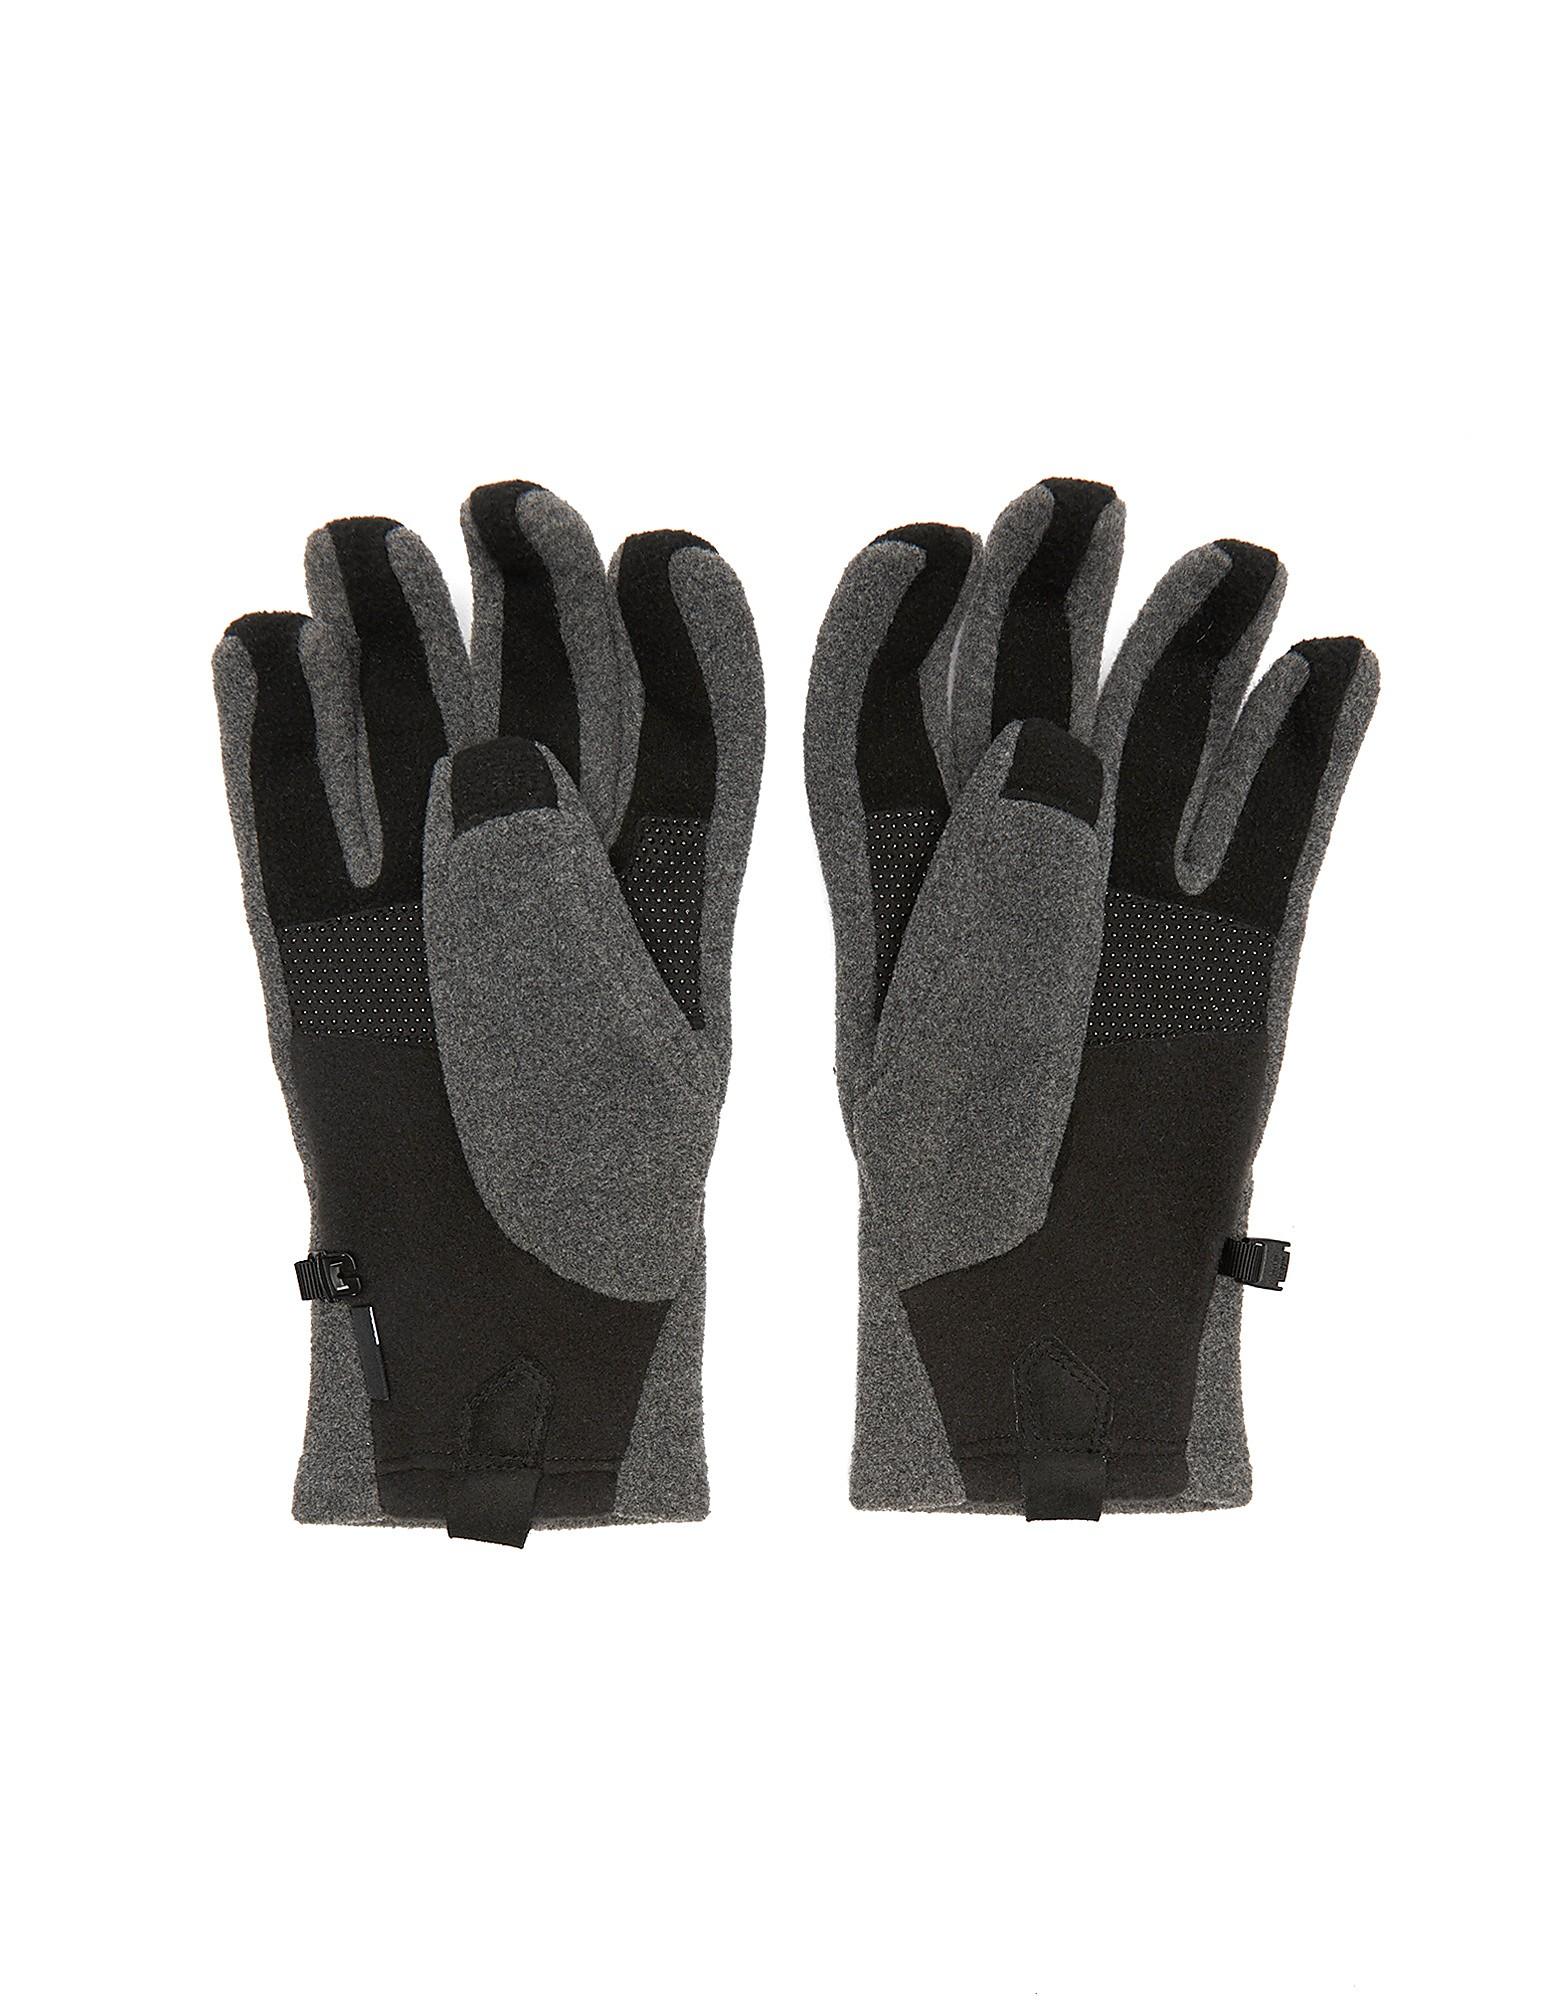 The North Face Denali Etip handschoenen